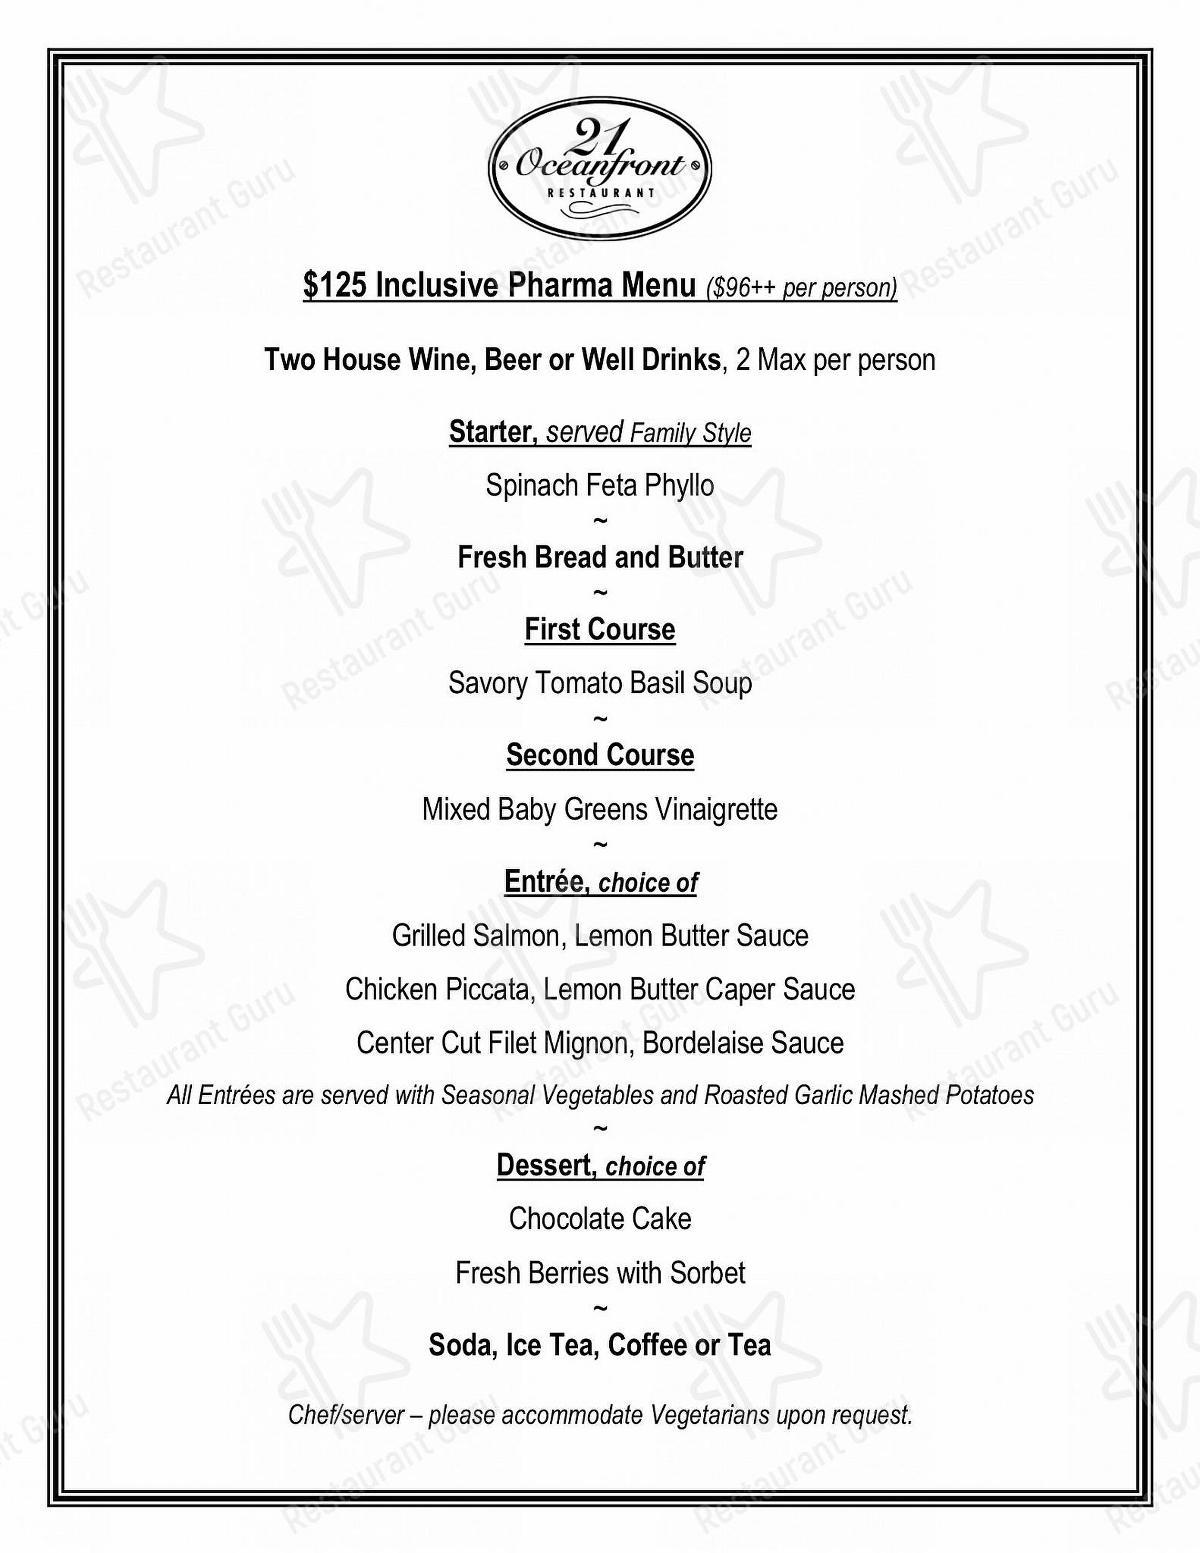 Menu for the 21 Oceanfront restaurant